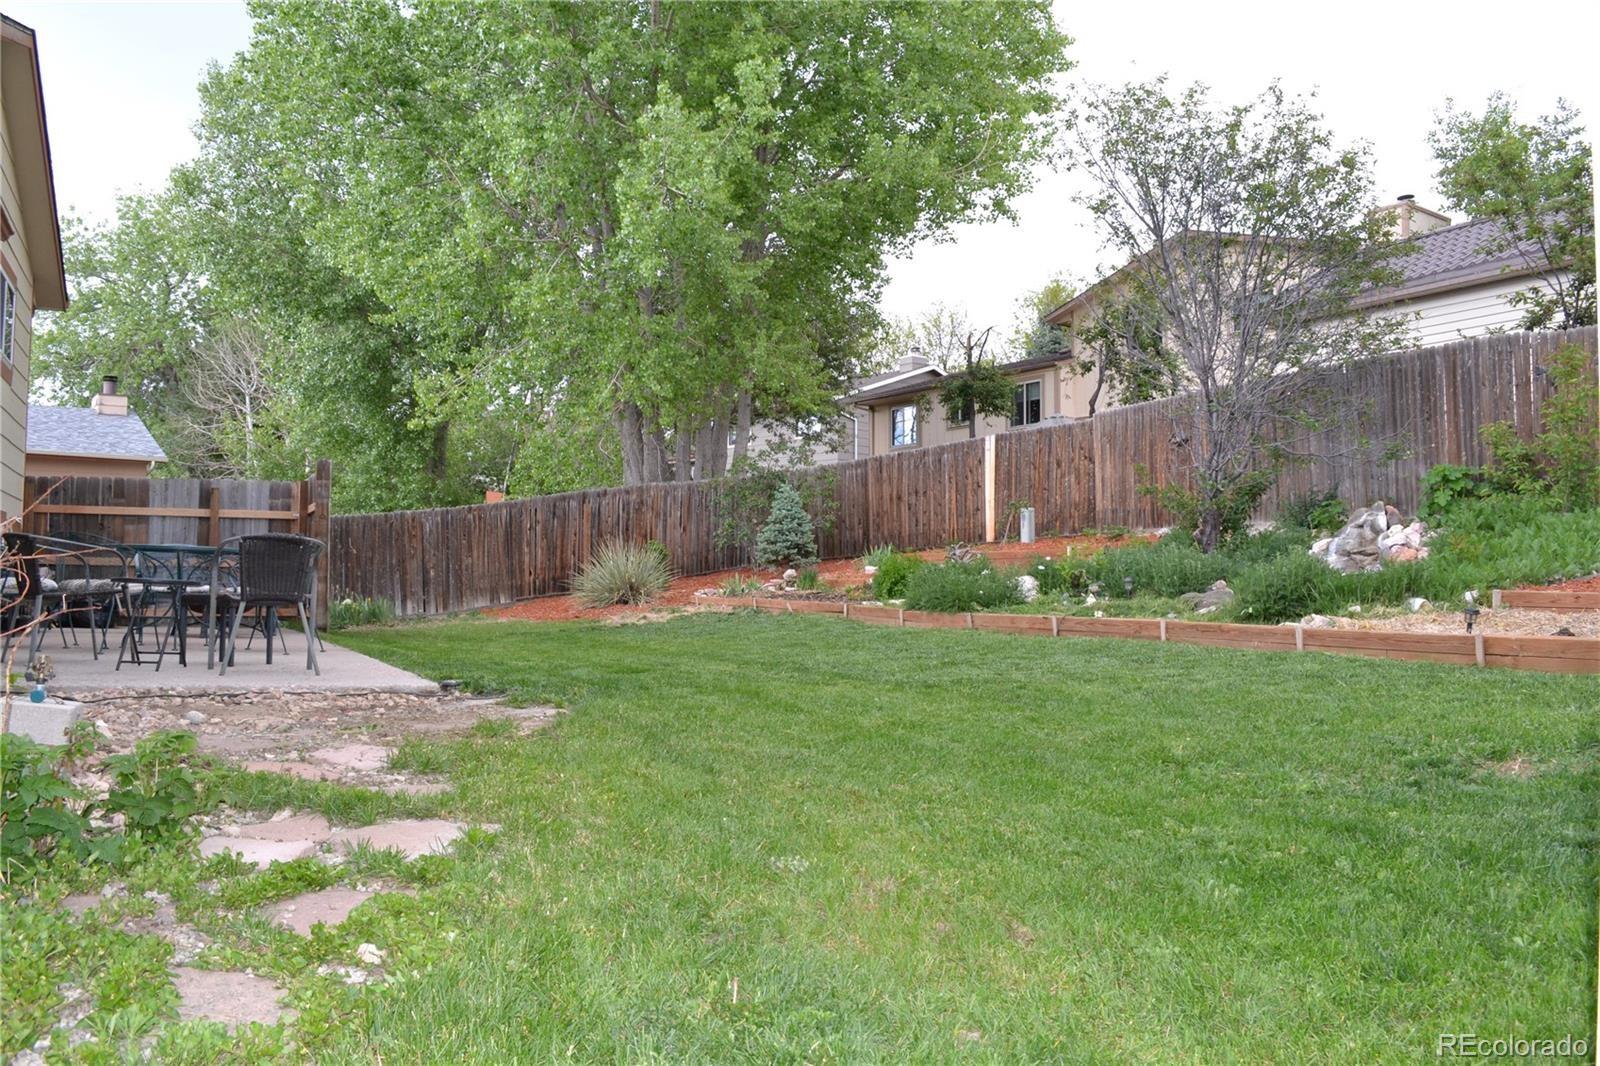 MLS# 4486712 - 16 - 5616 Trout Creek Pass Drive, Colorado Springs, CO 80917